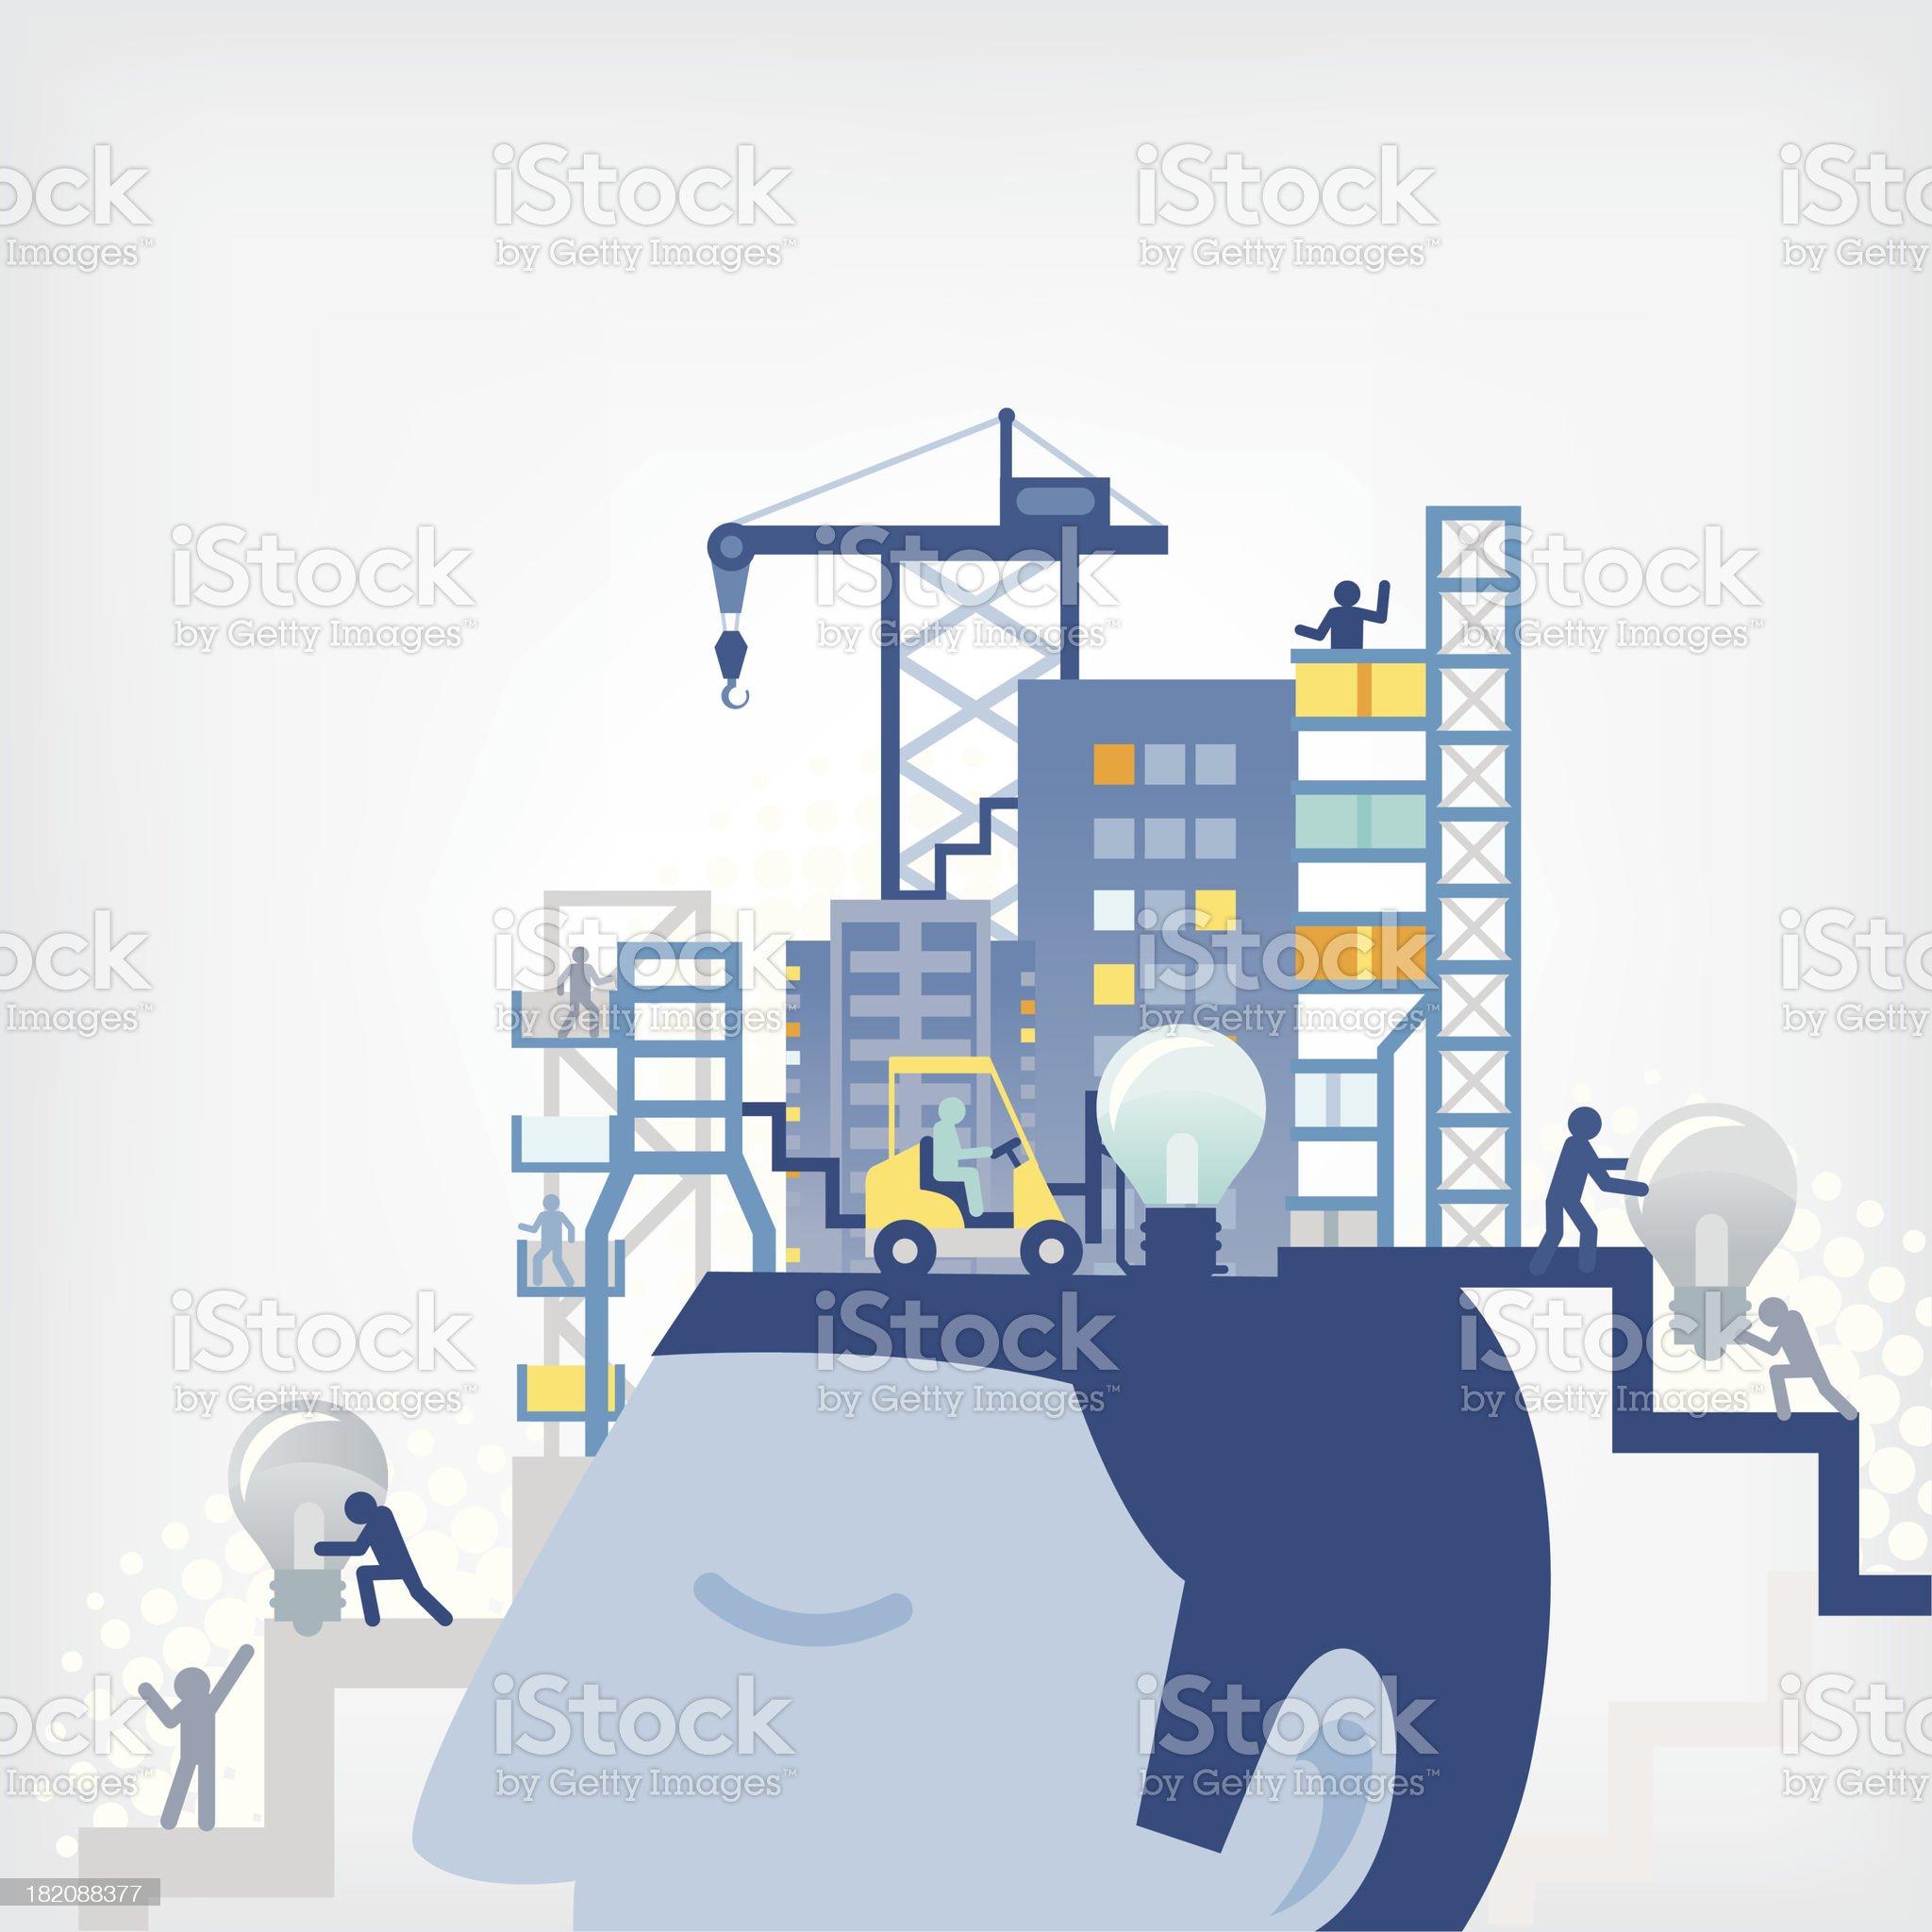 Creative/Business concept royalty-free stock vector art